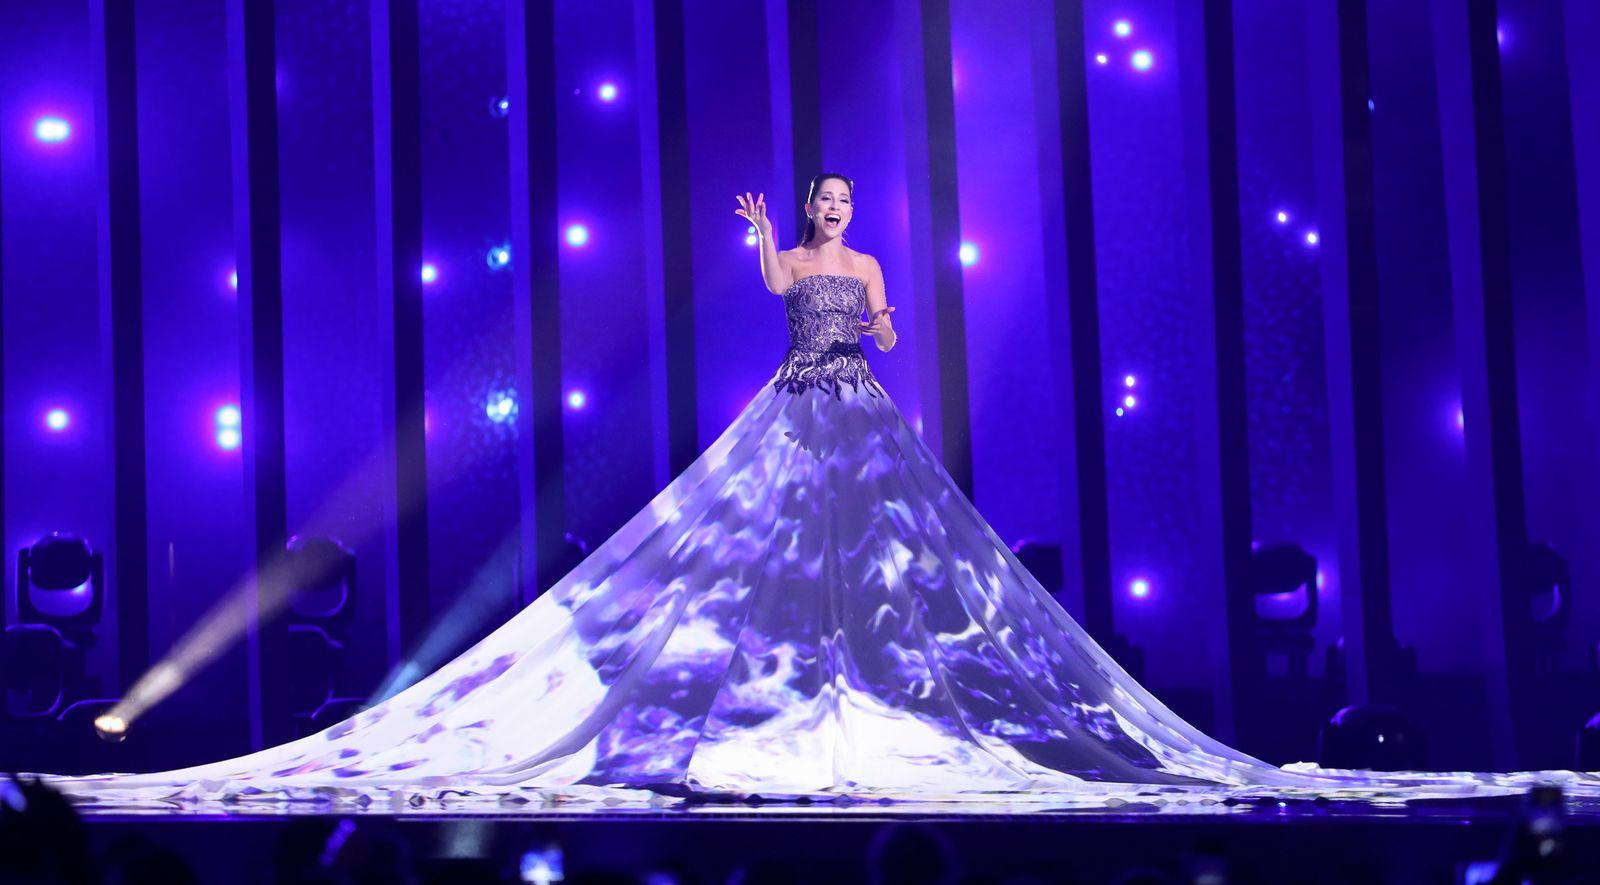 Eurovision Song Contest 2018 - erstes Halbfinale